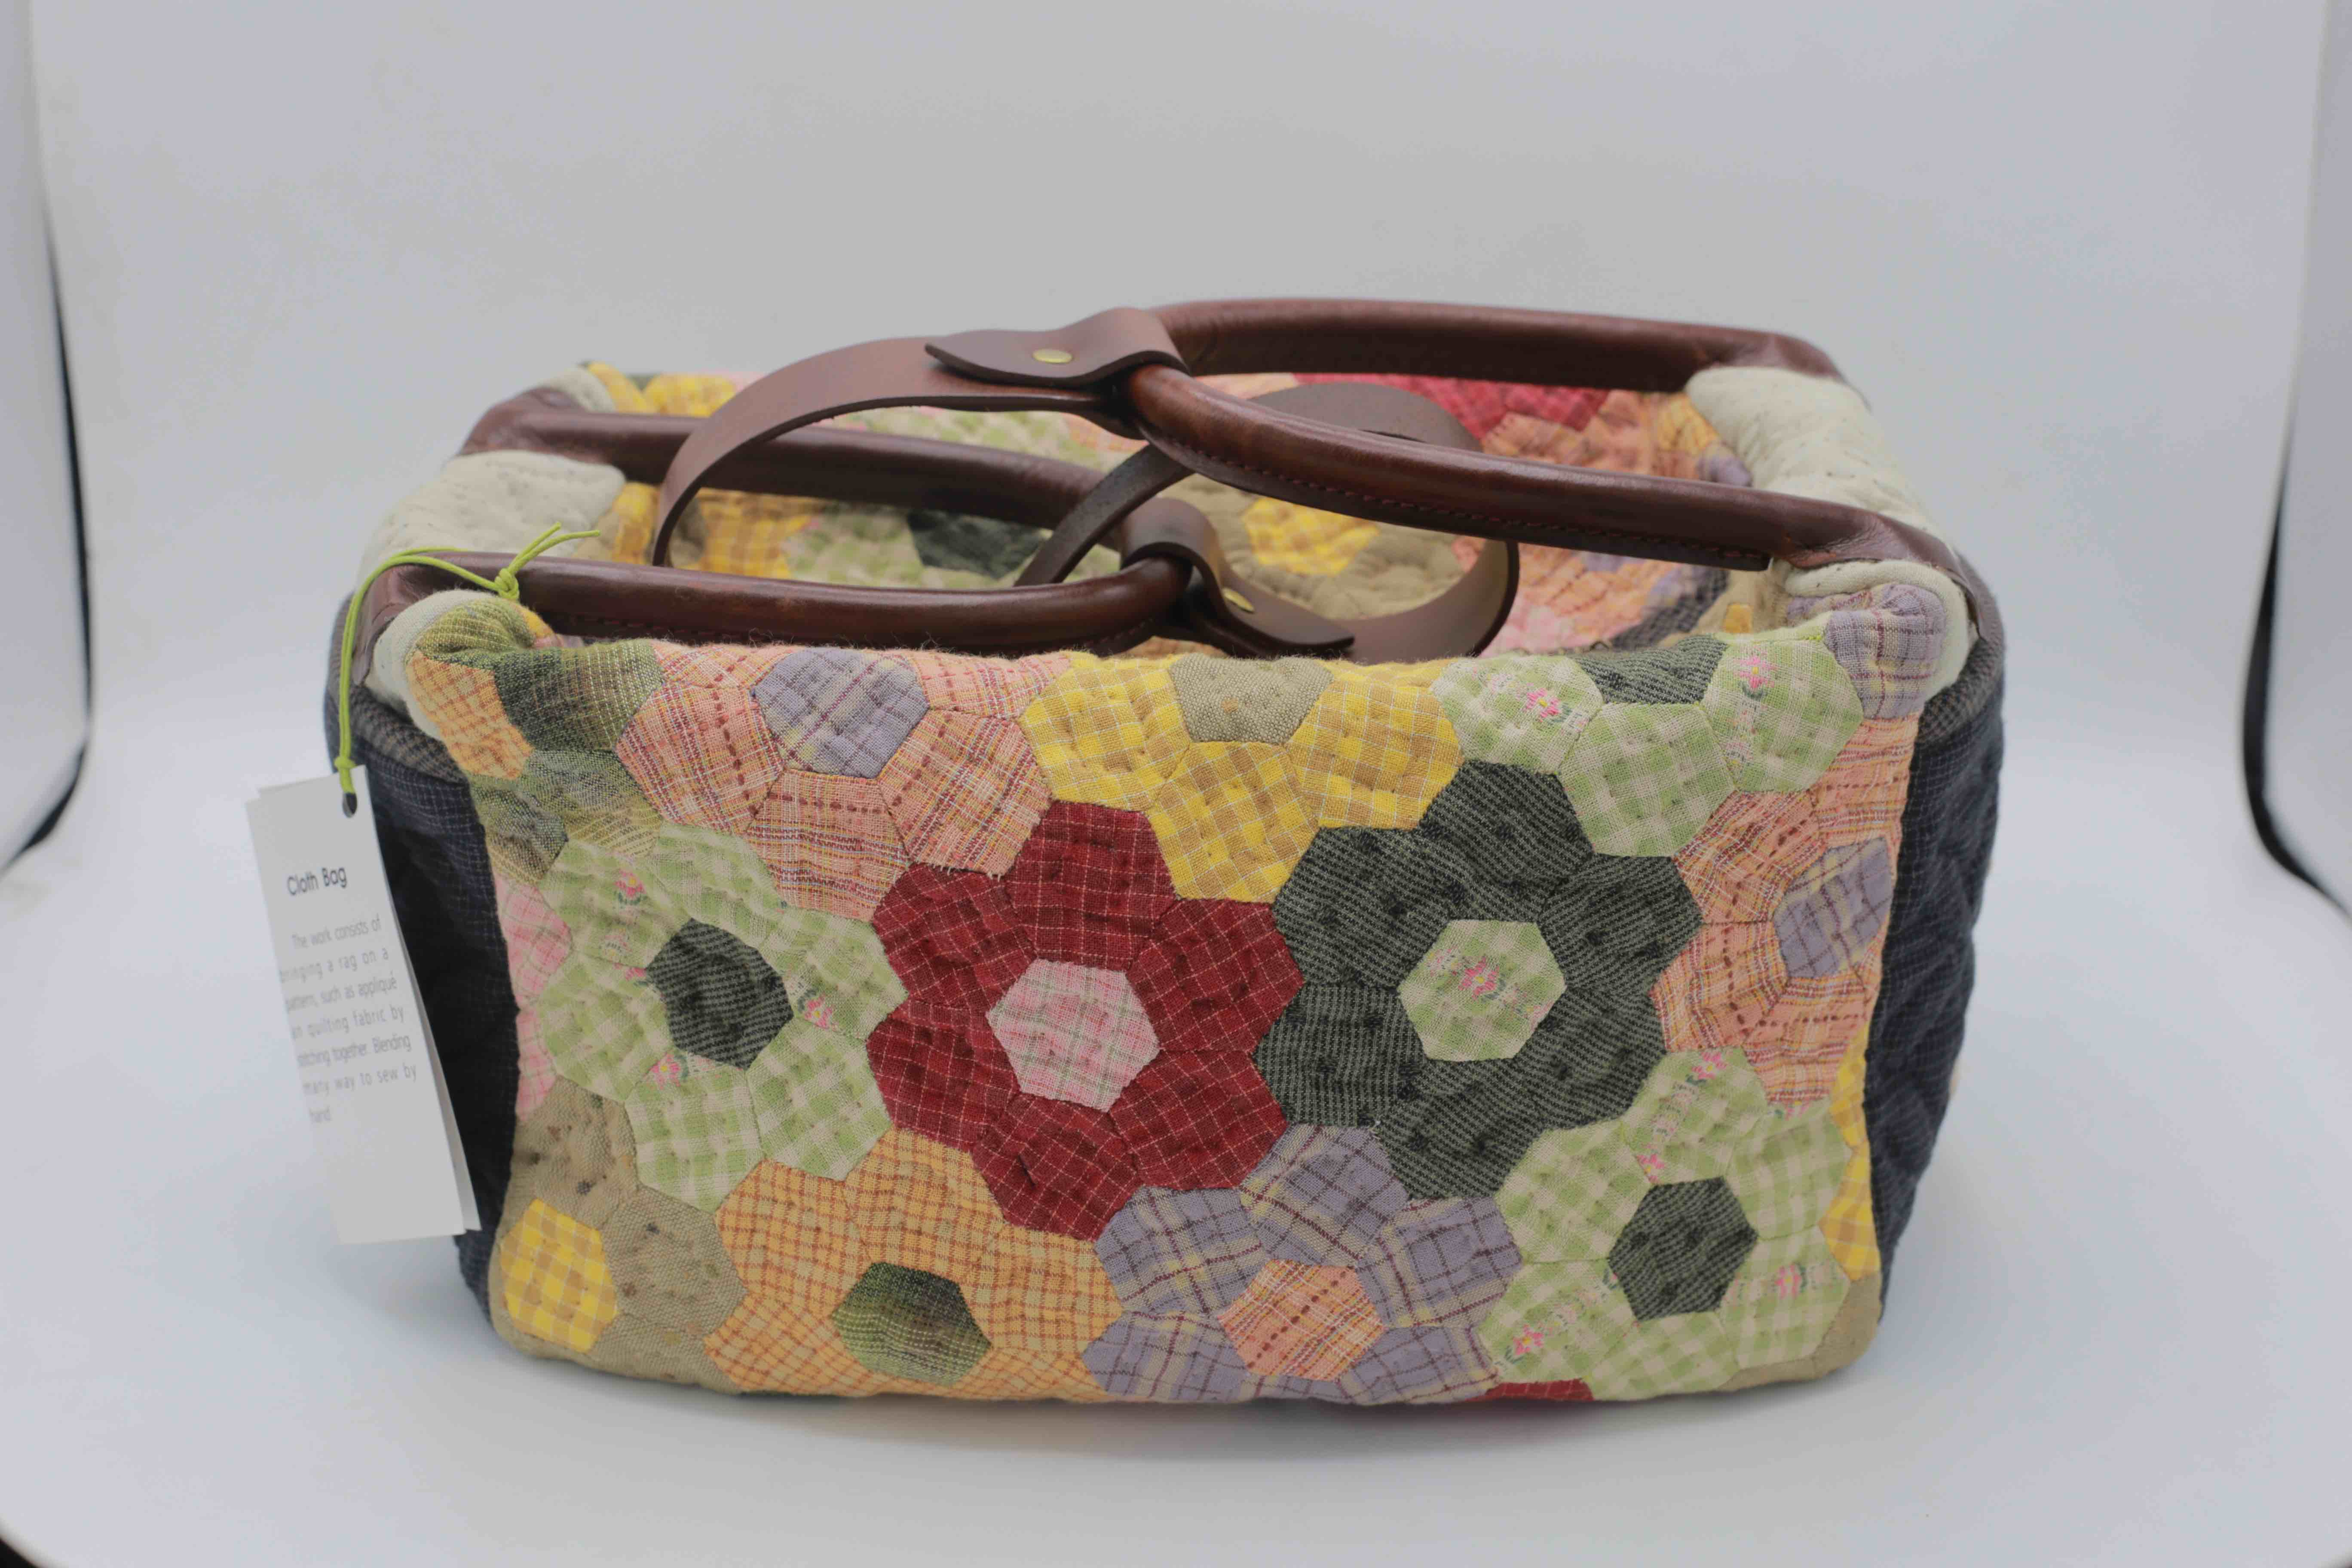 C04014 กระเป๋าผ้าหรรษา